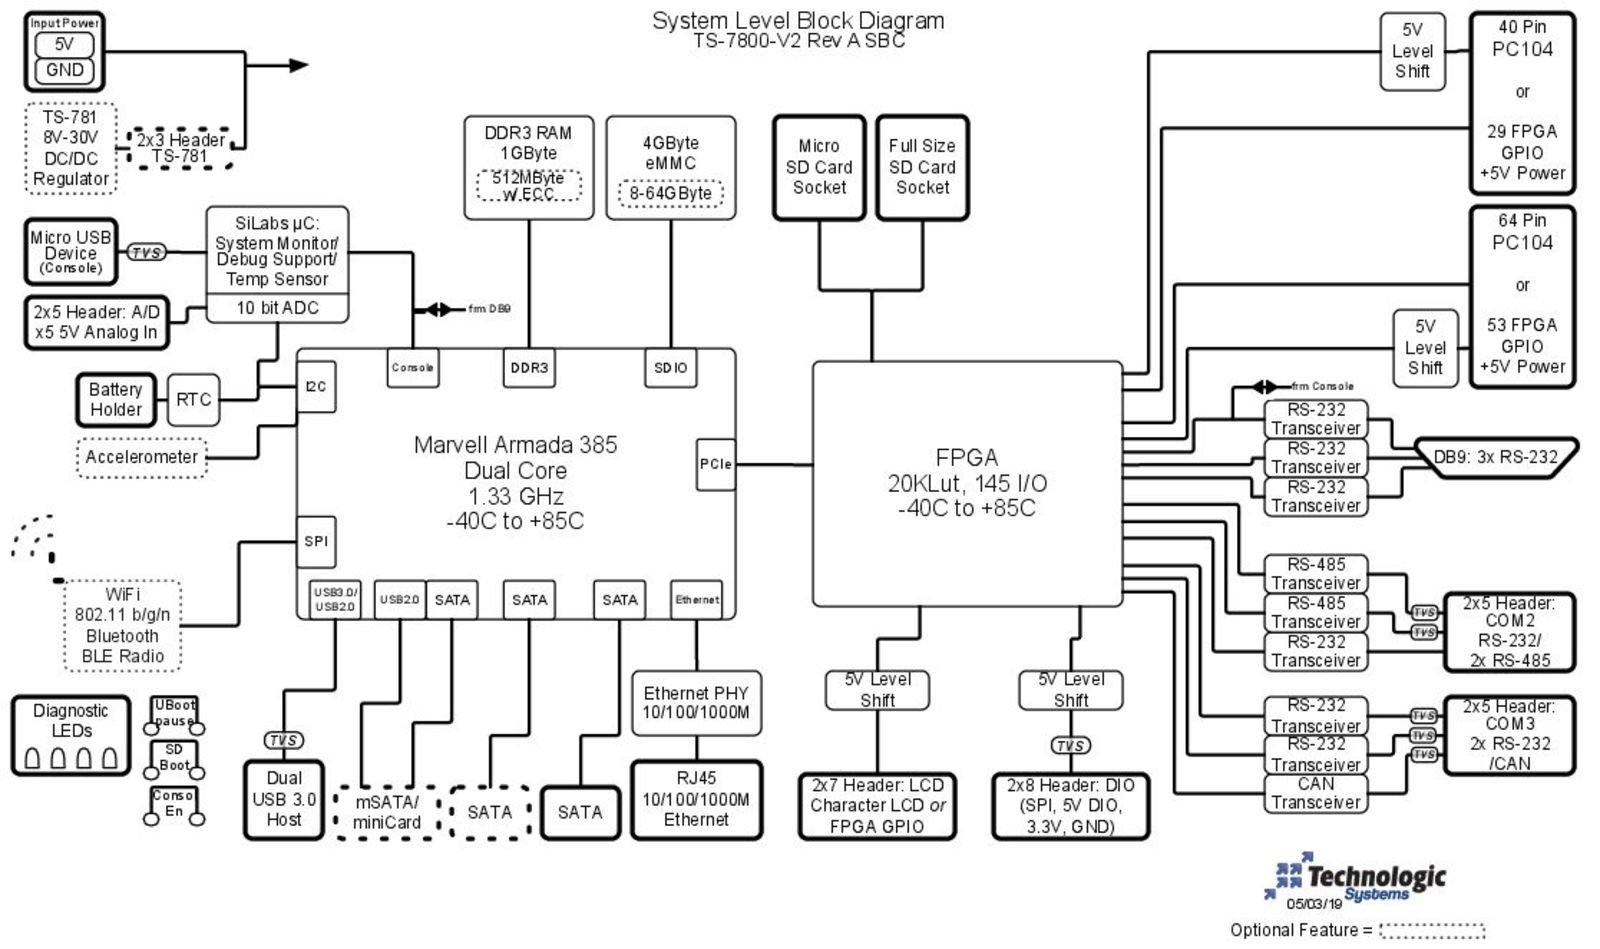 TS-7800-V2 Block Diagram Image